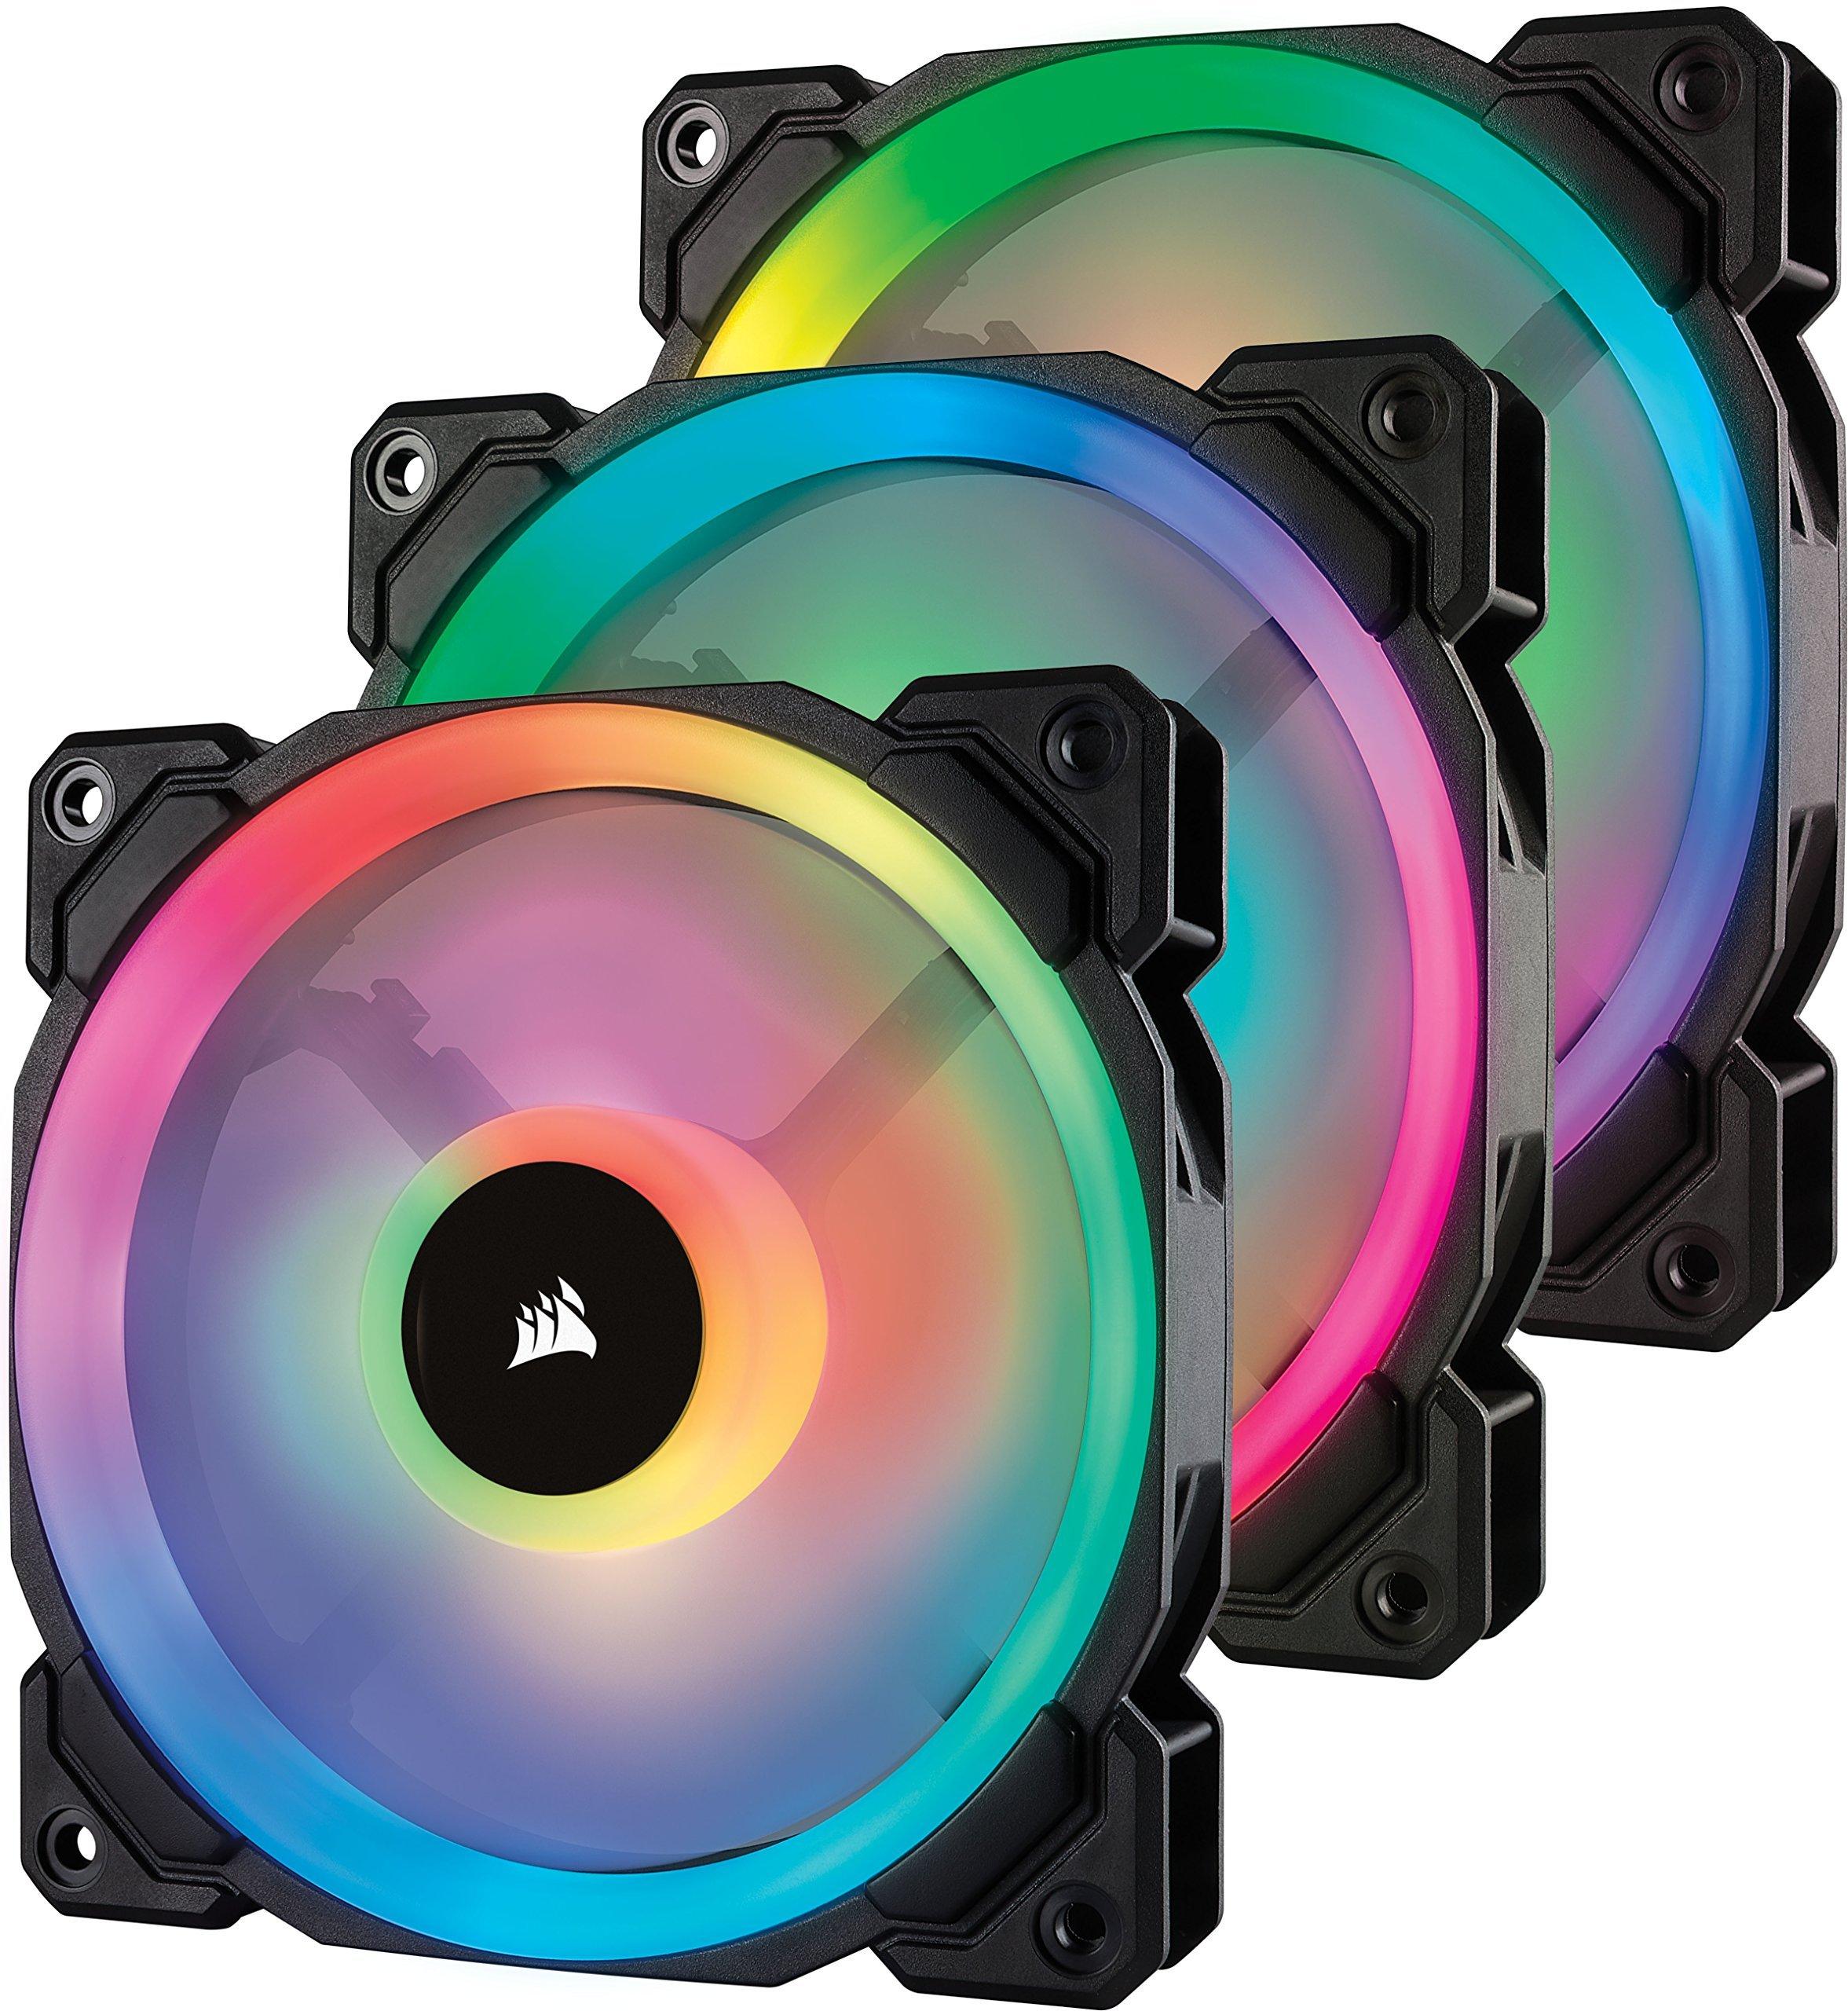 Corsair LL Series LL120 RGB 120mm Dual Light Loop RGB LED PWM Fan 3 Fan Pack with Lighting Node Pro (Renewed) by Corsair (Image #1)